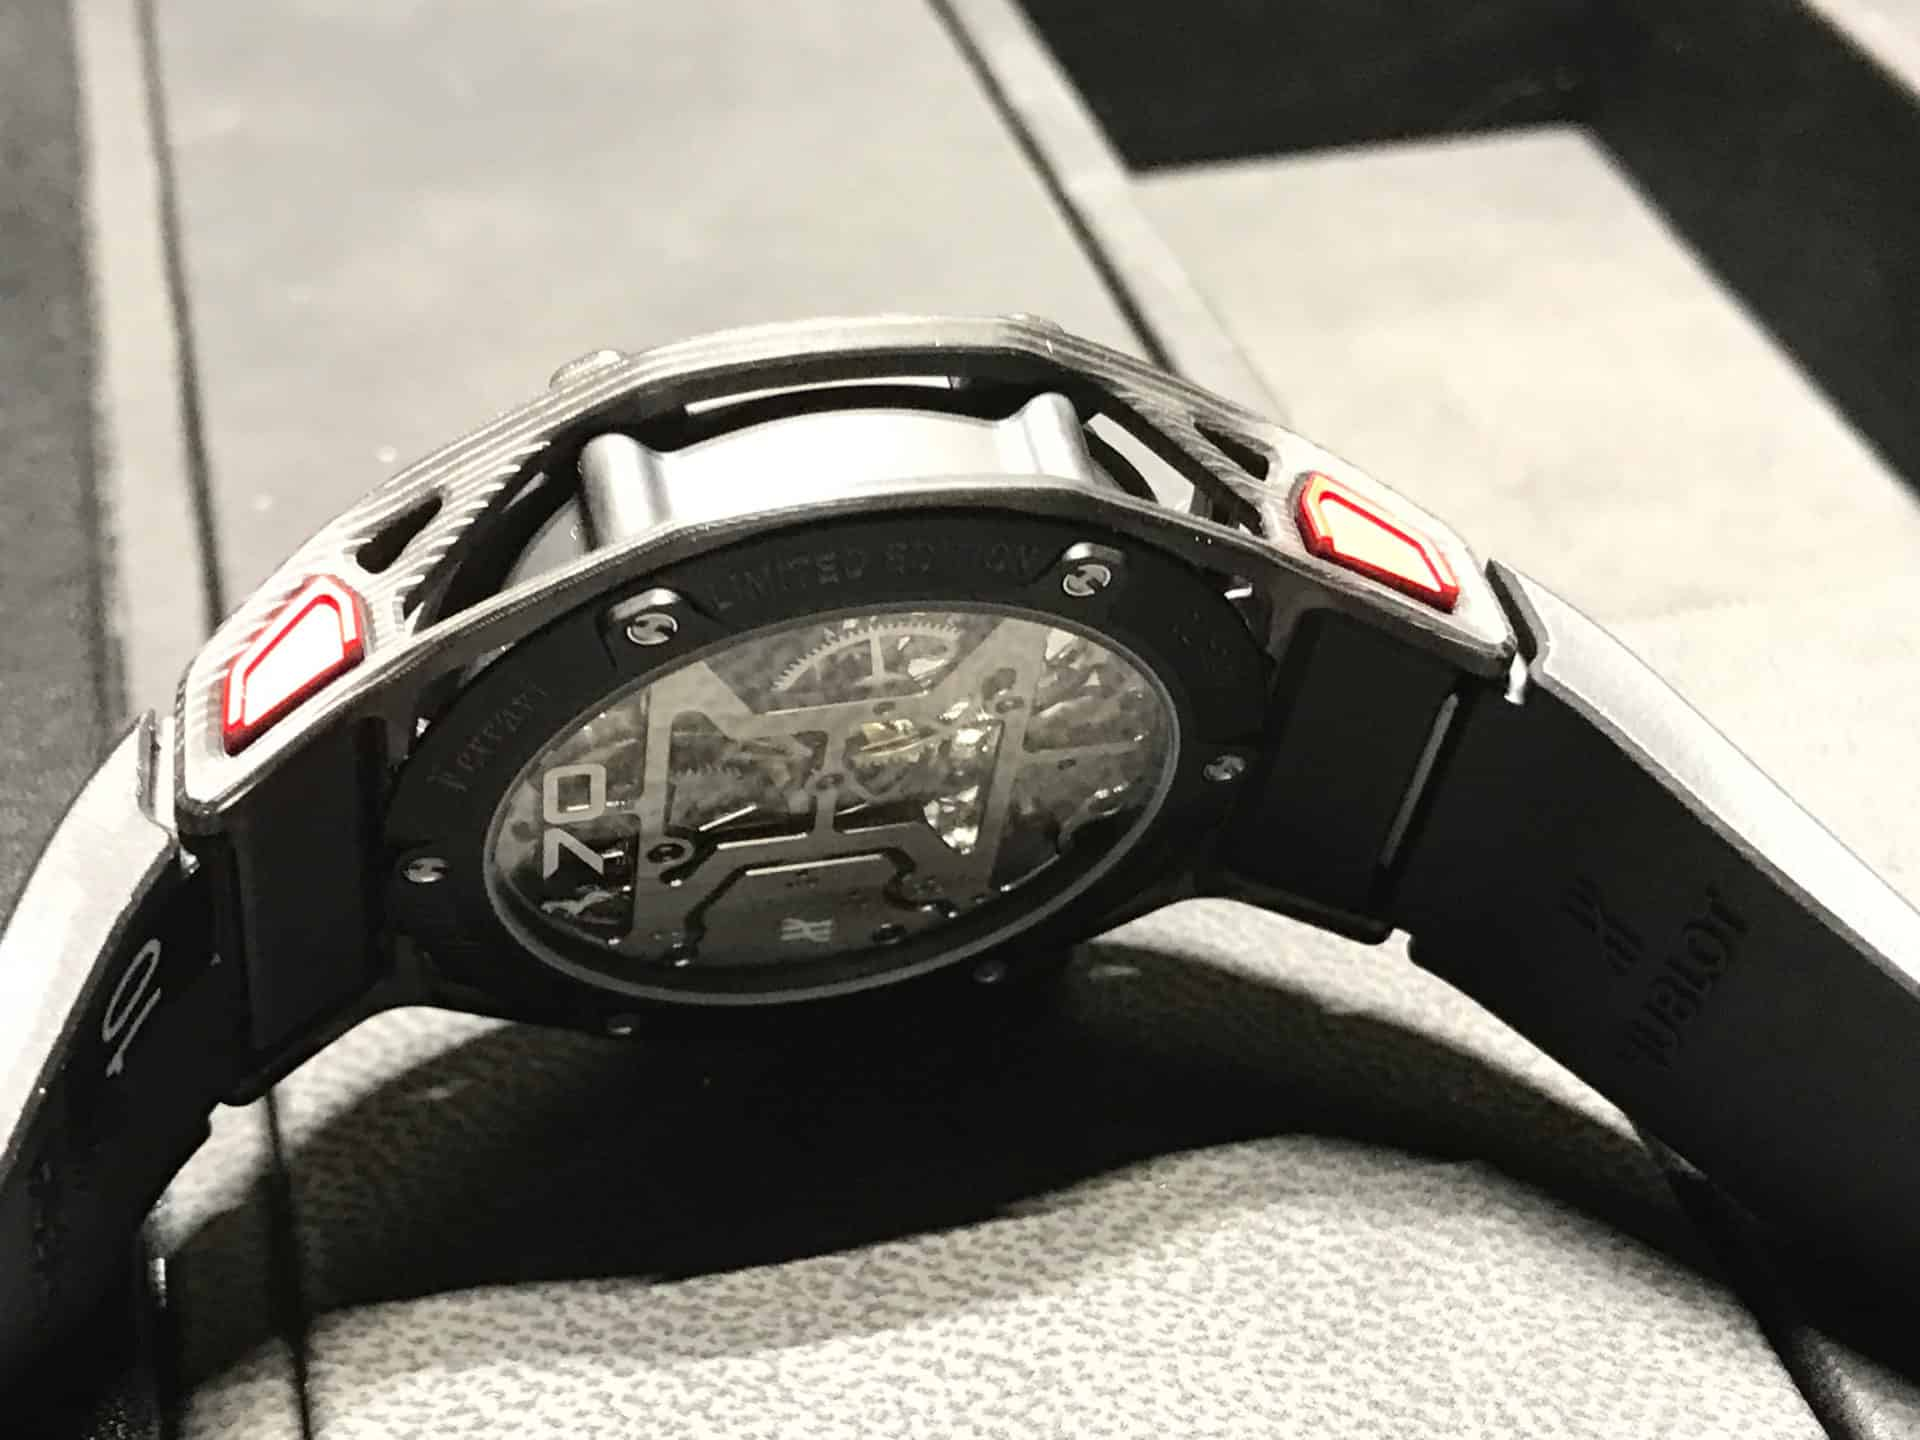 Hublot . Techframe Ferrari 70 years Tourbillon Chronograph - 2017_4